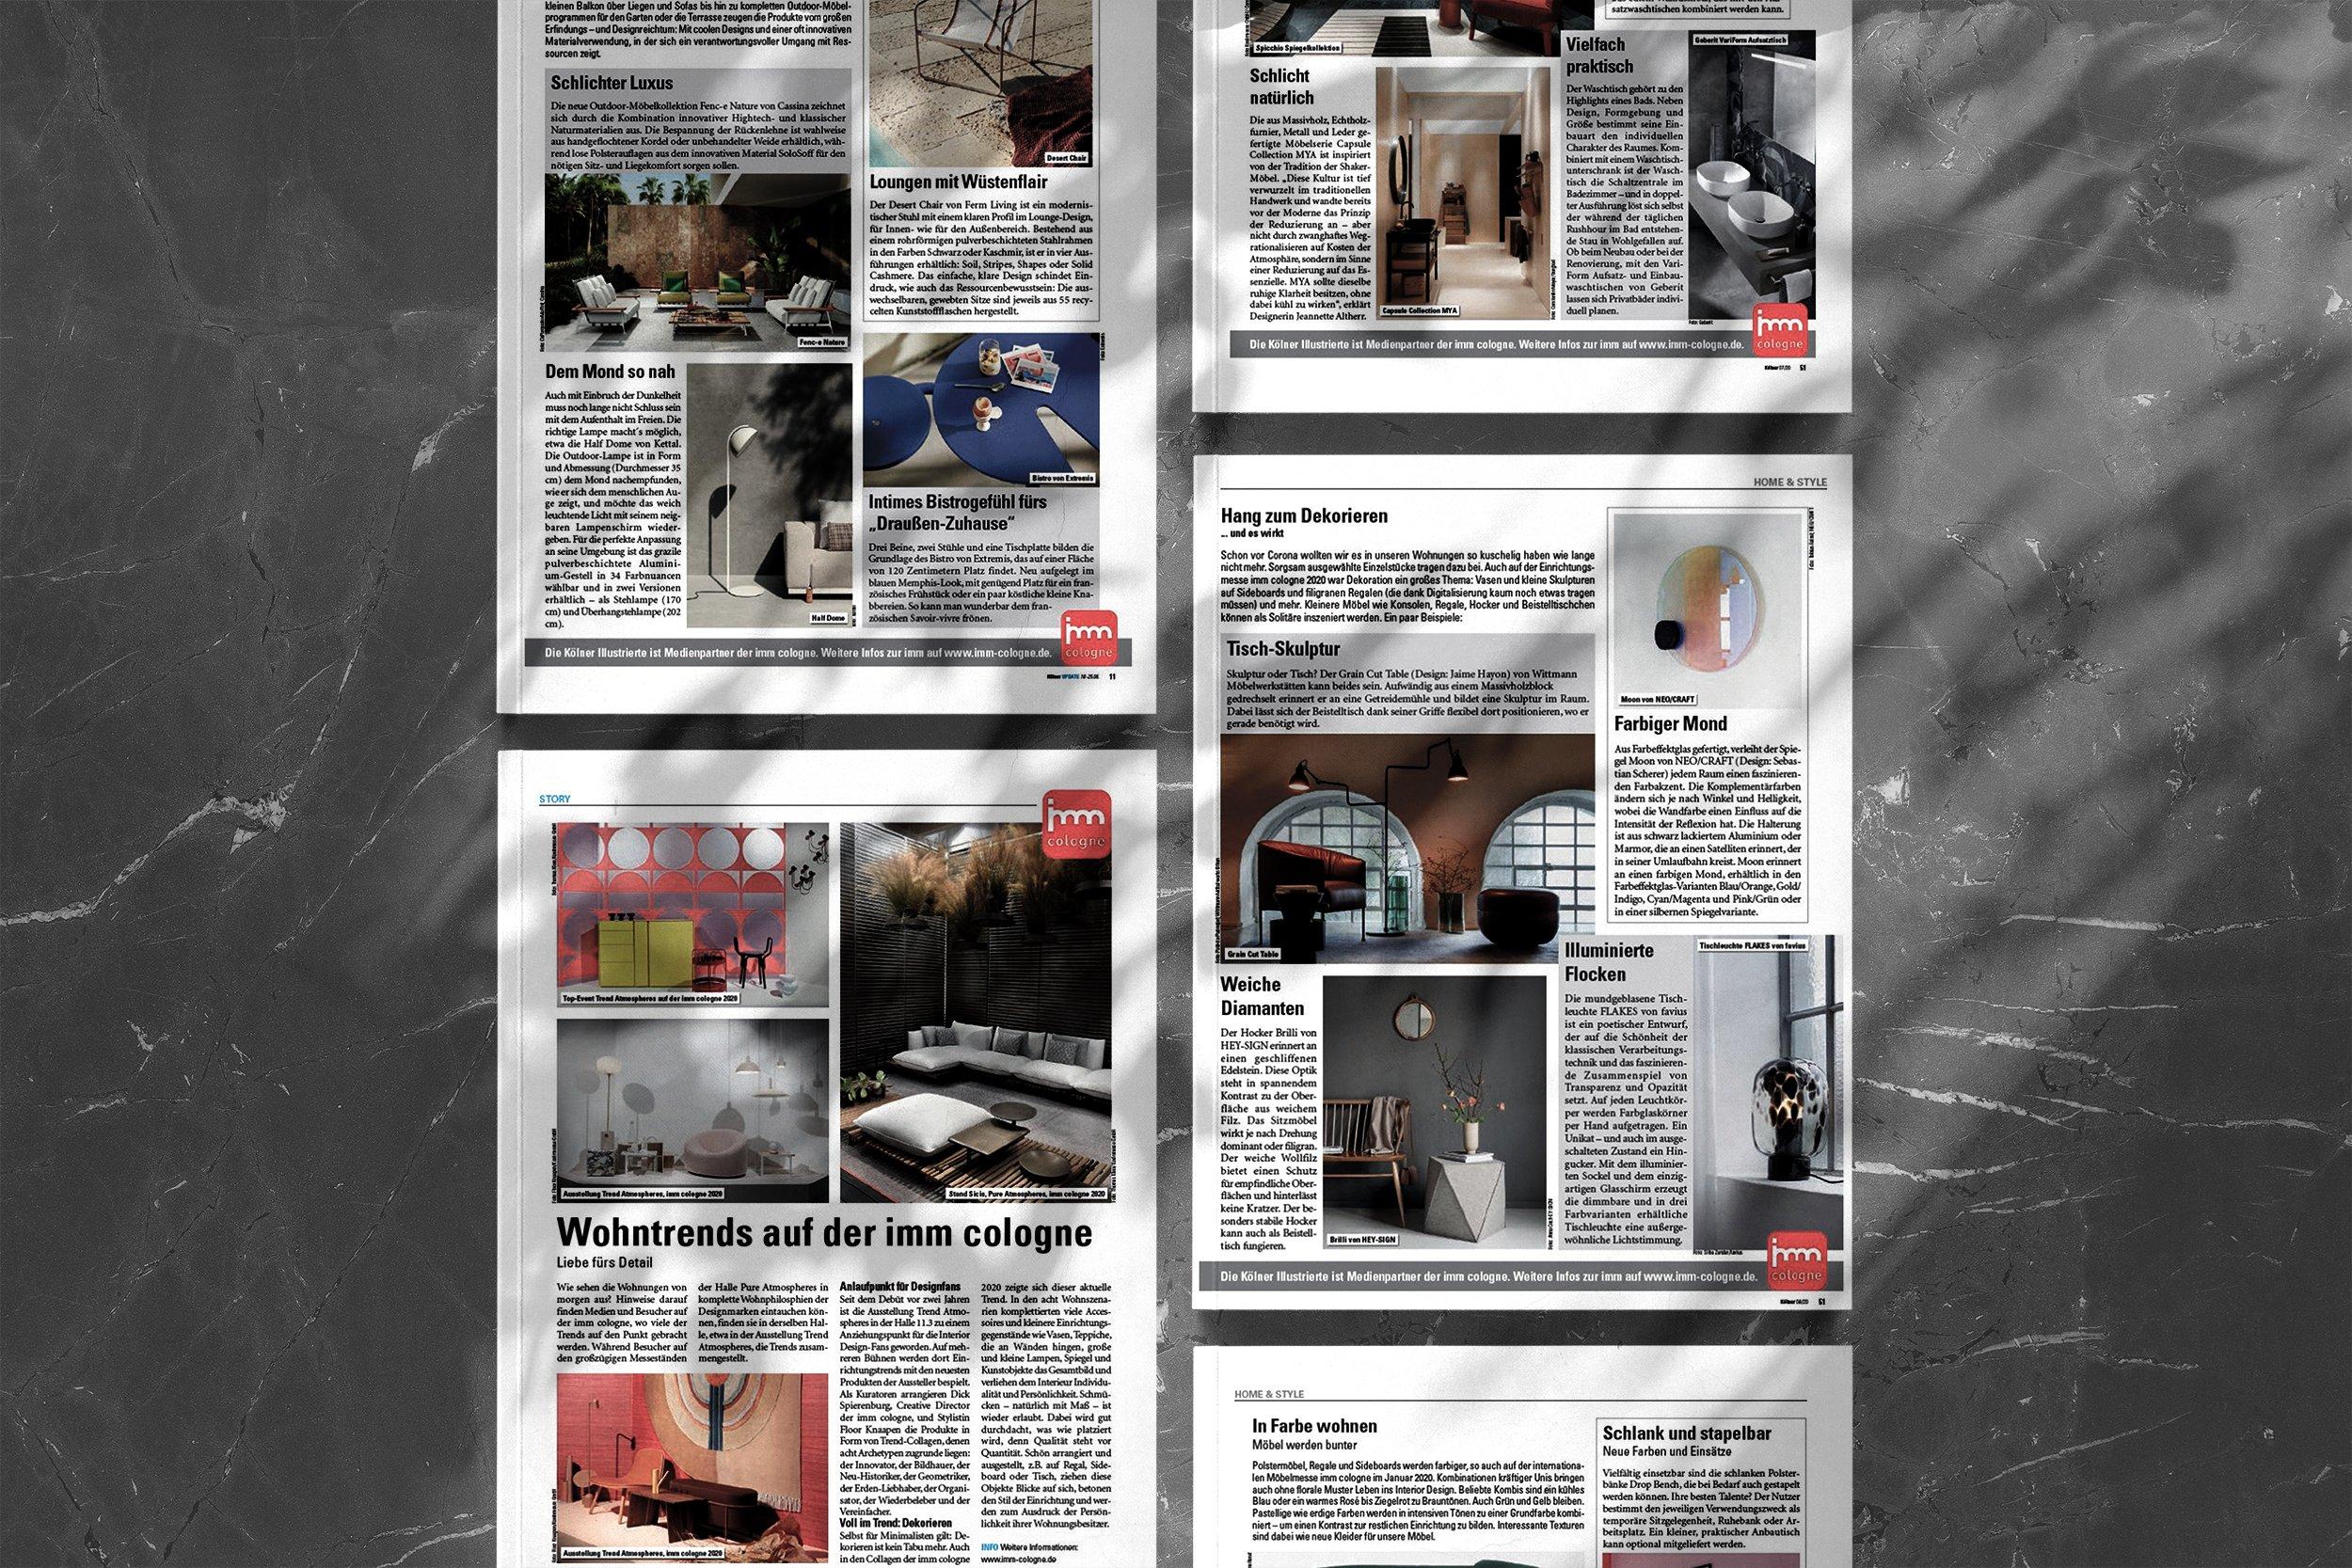 https://farconsulting.de/wp-content/uploads/2020/08/2020_home_Style_koelner_far.jpg